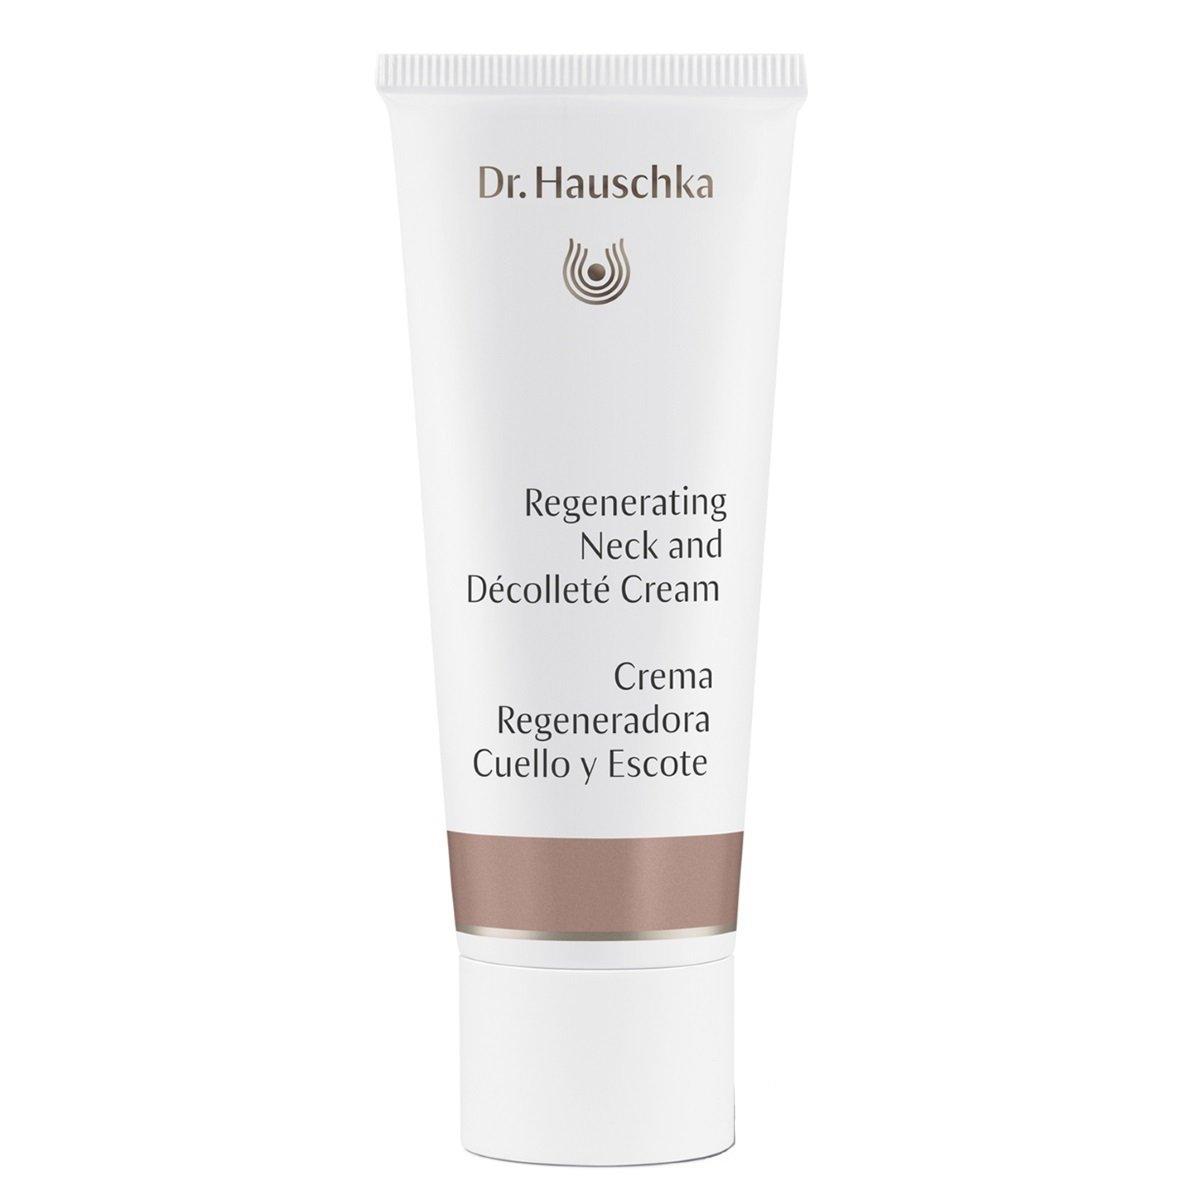 Dr Hauschka, Neck Decollete Cream Regenerating, 1.3 Fl Oz